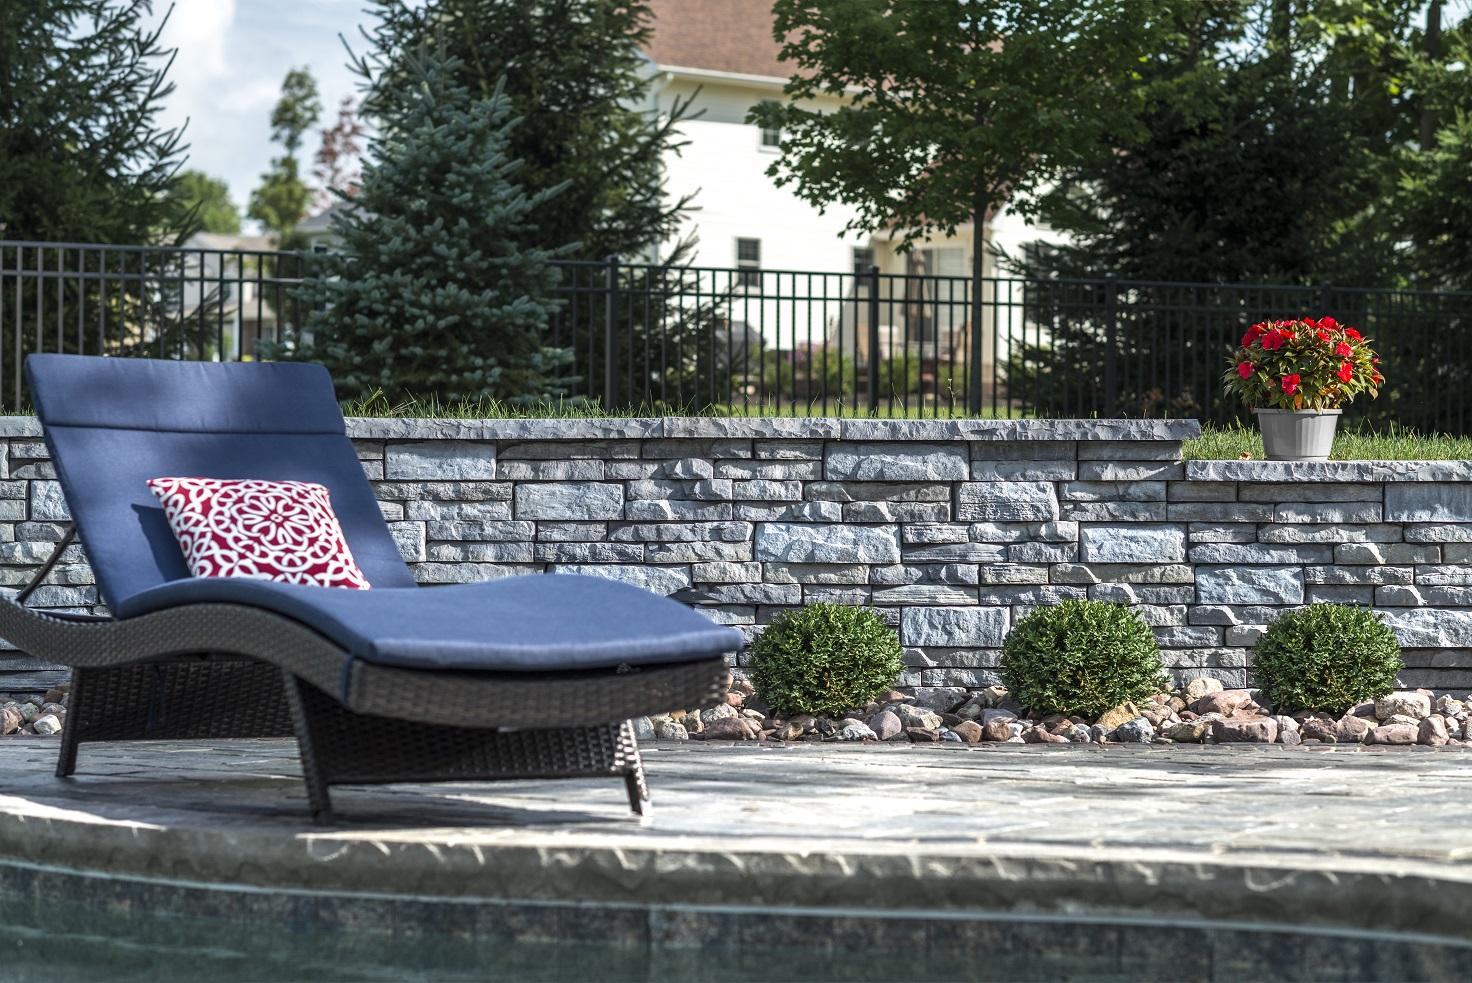 Commercial landscaping design in Glen Ellyn, IL